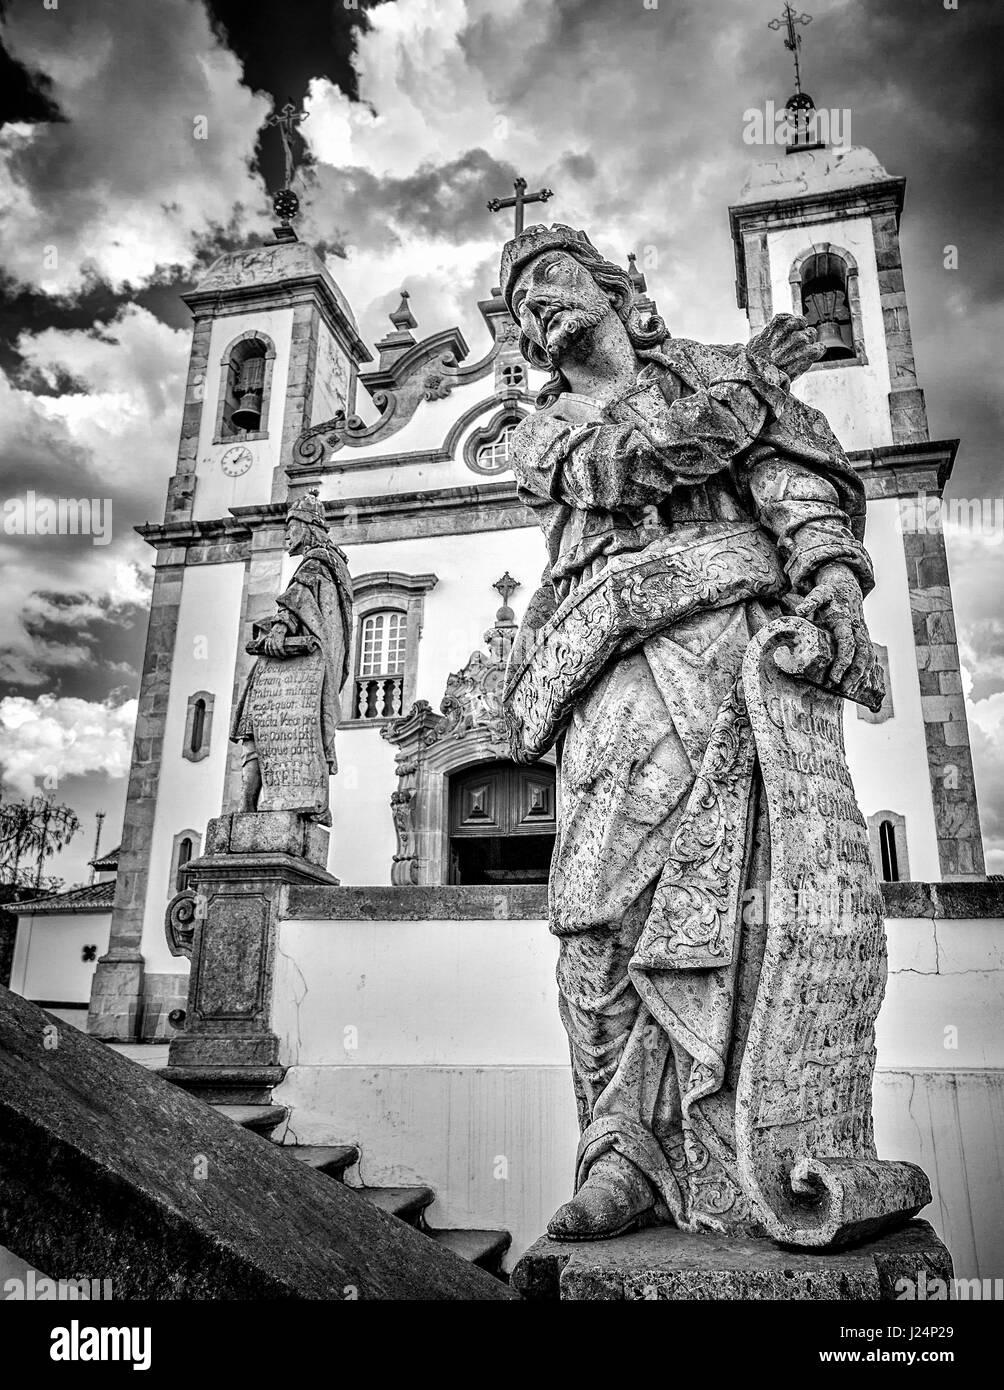 Prophet Ezekiel at the Basilica do Bom Jesus de Matosinhos in Minas Gerais, Brazil - Stock Image